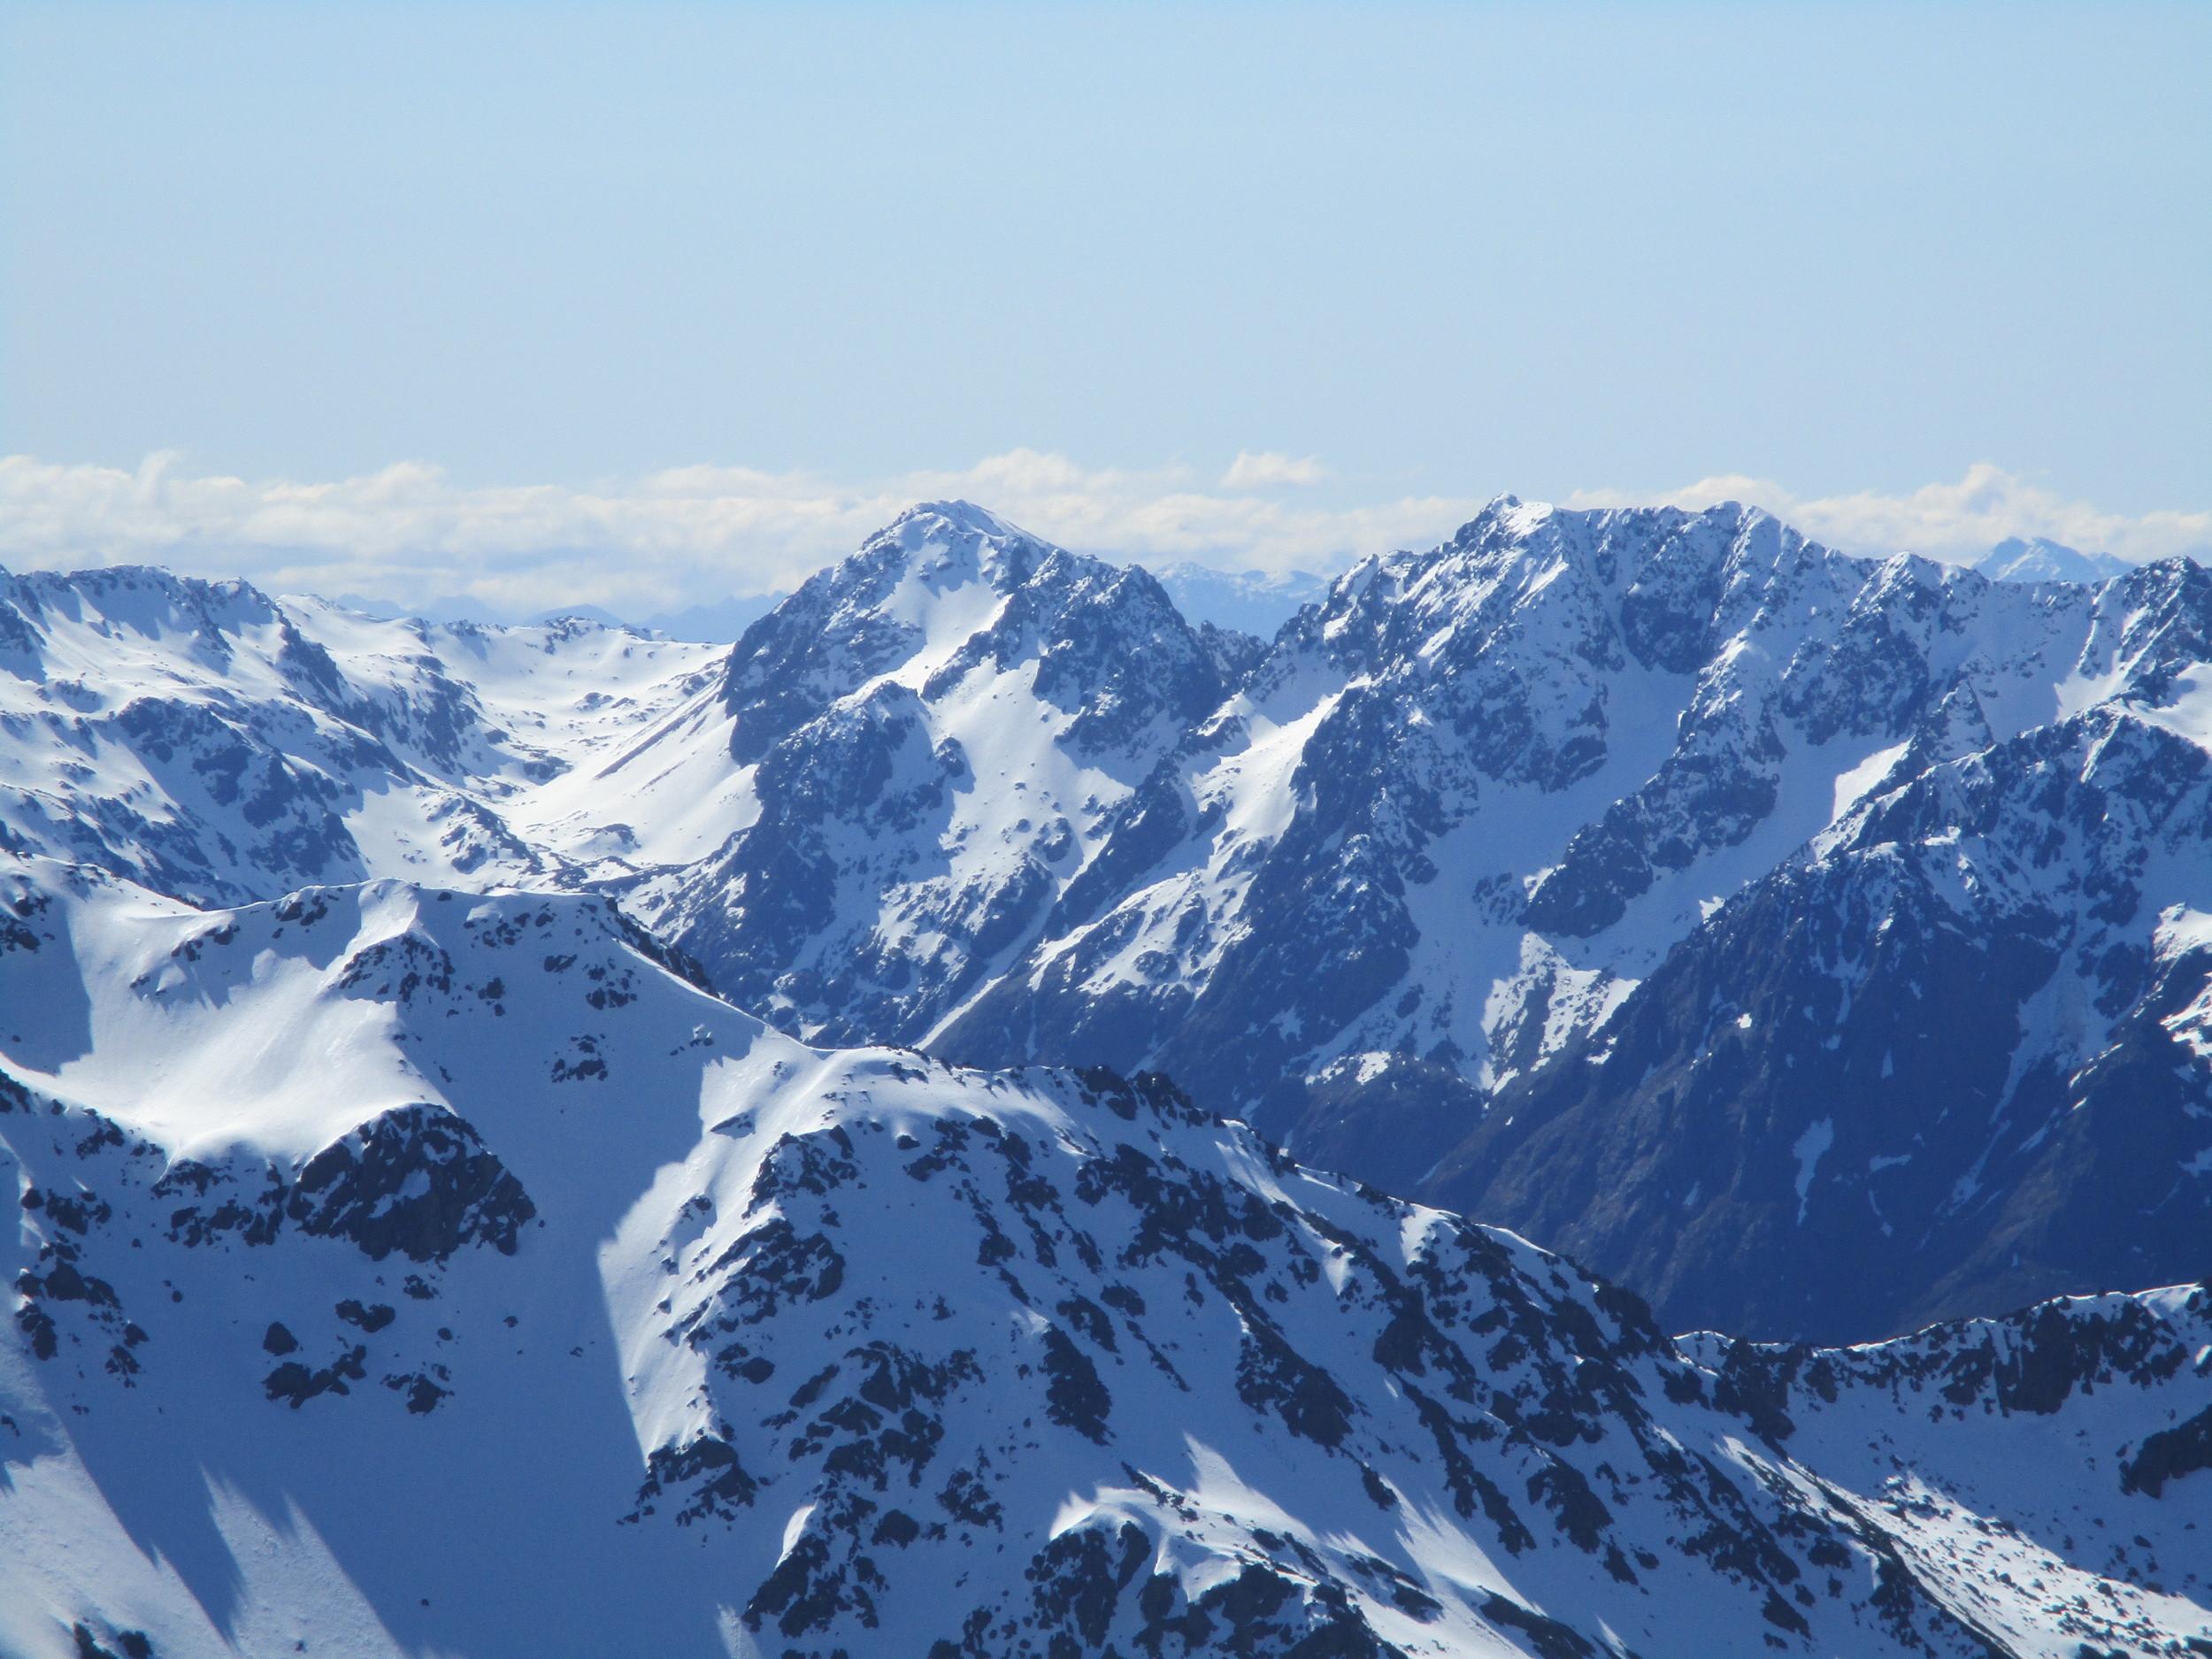 Mt Angelus and the Angelus ridge in winter